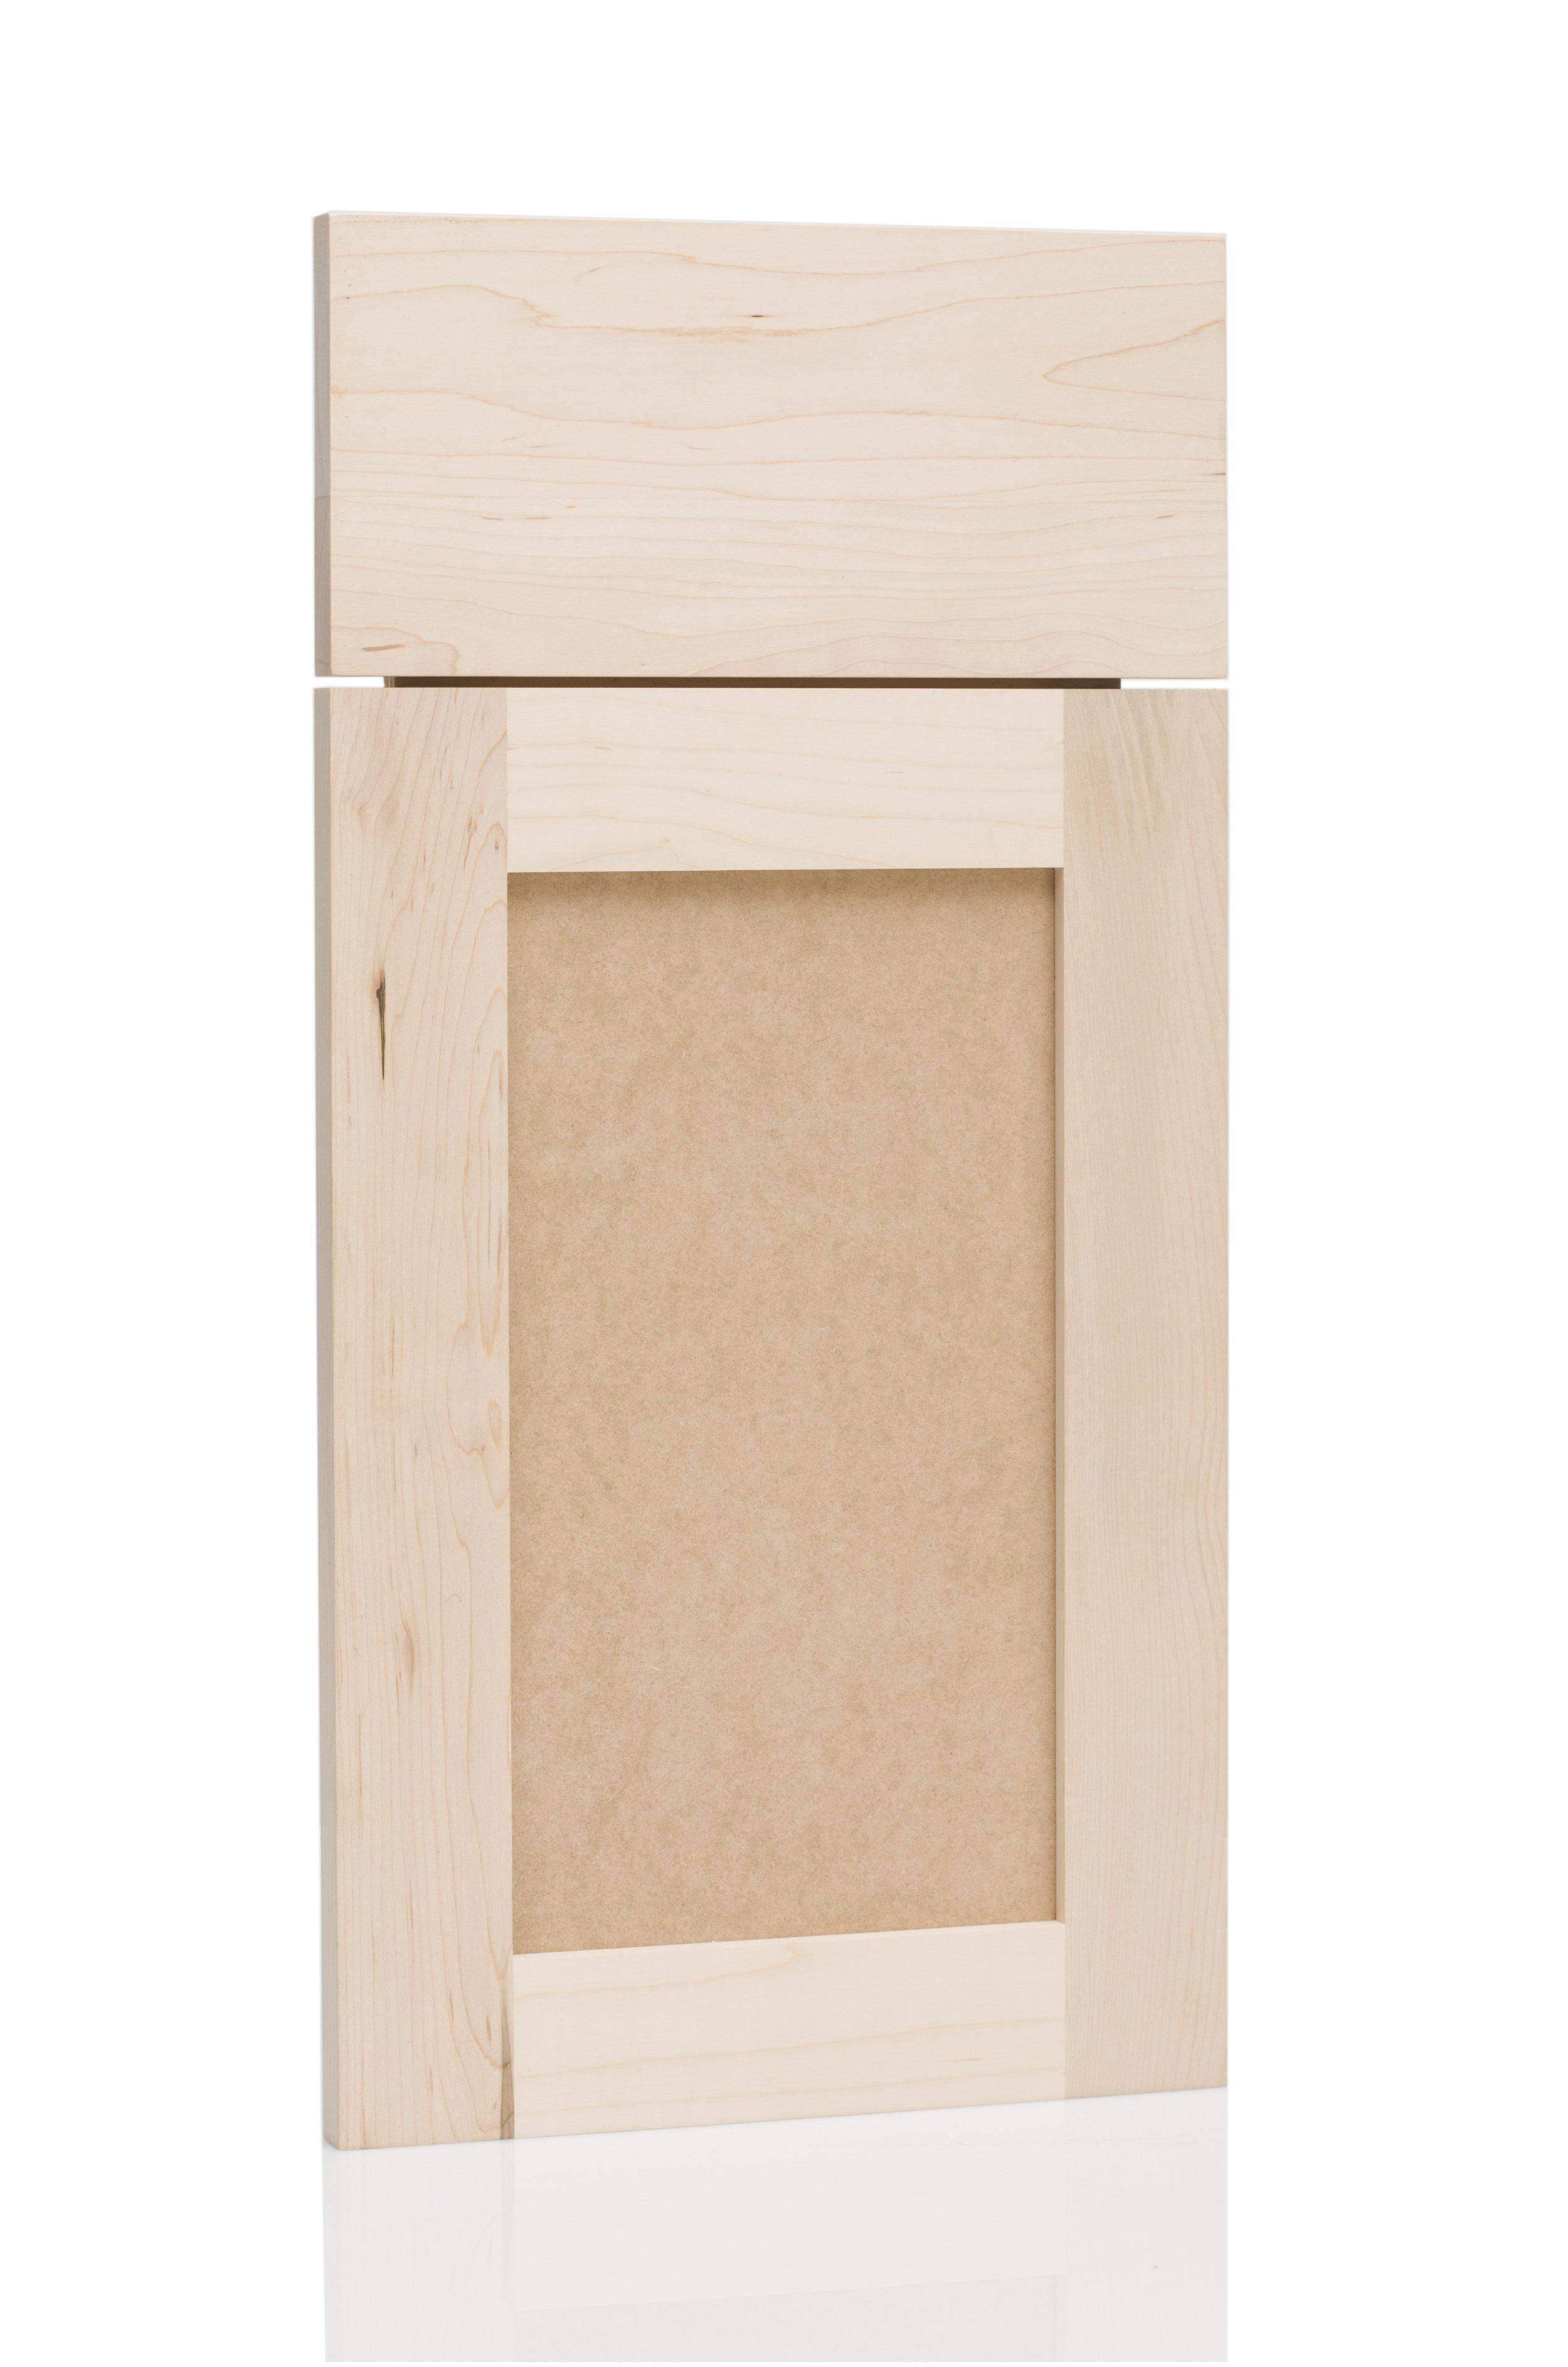 Kokeena Unfinished Panel Door Side.jpg